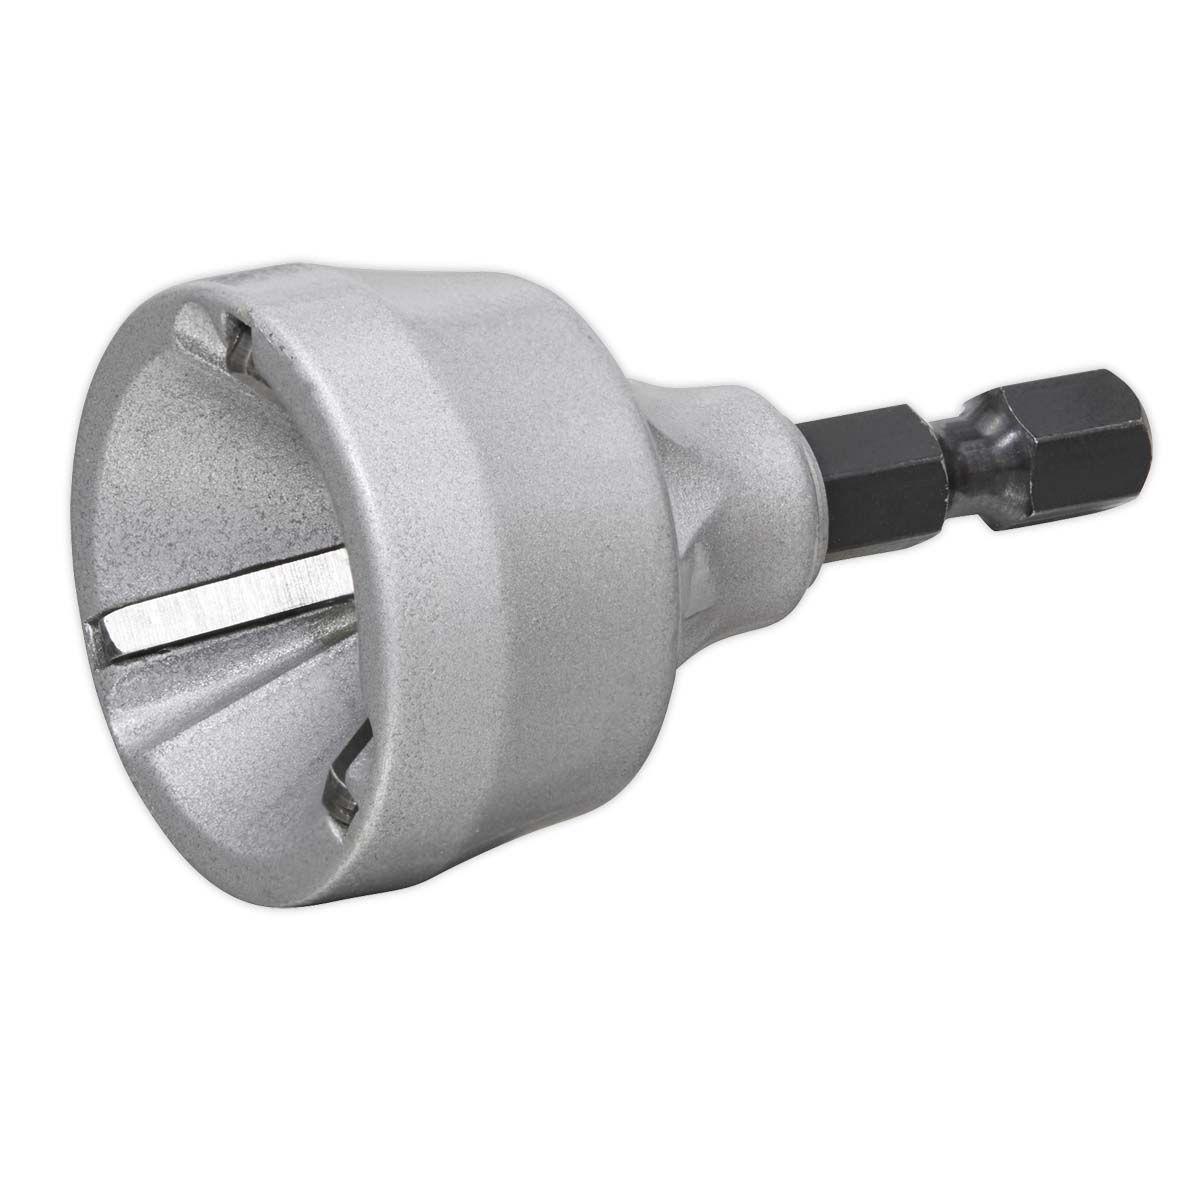 Sealey External Deburring/Chamfer Tool 3-19mm